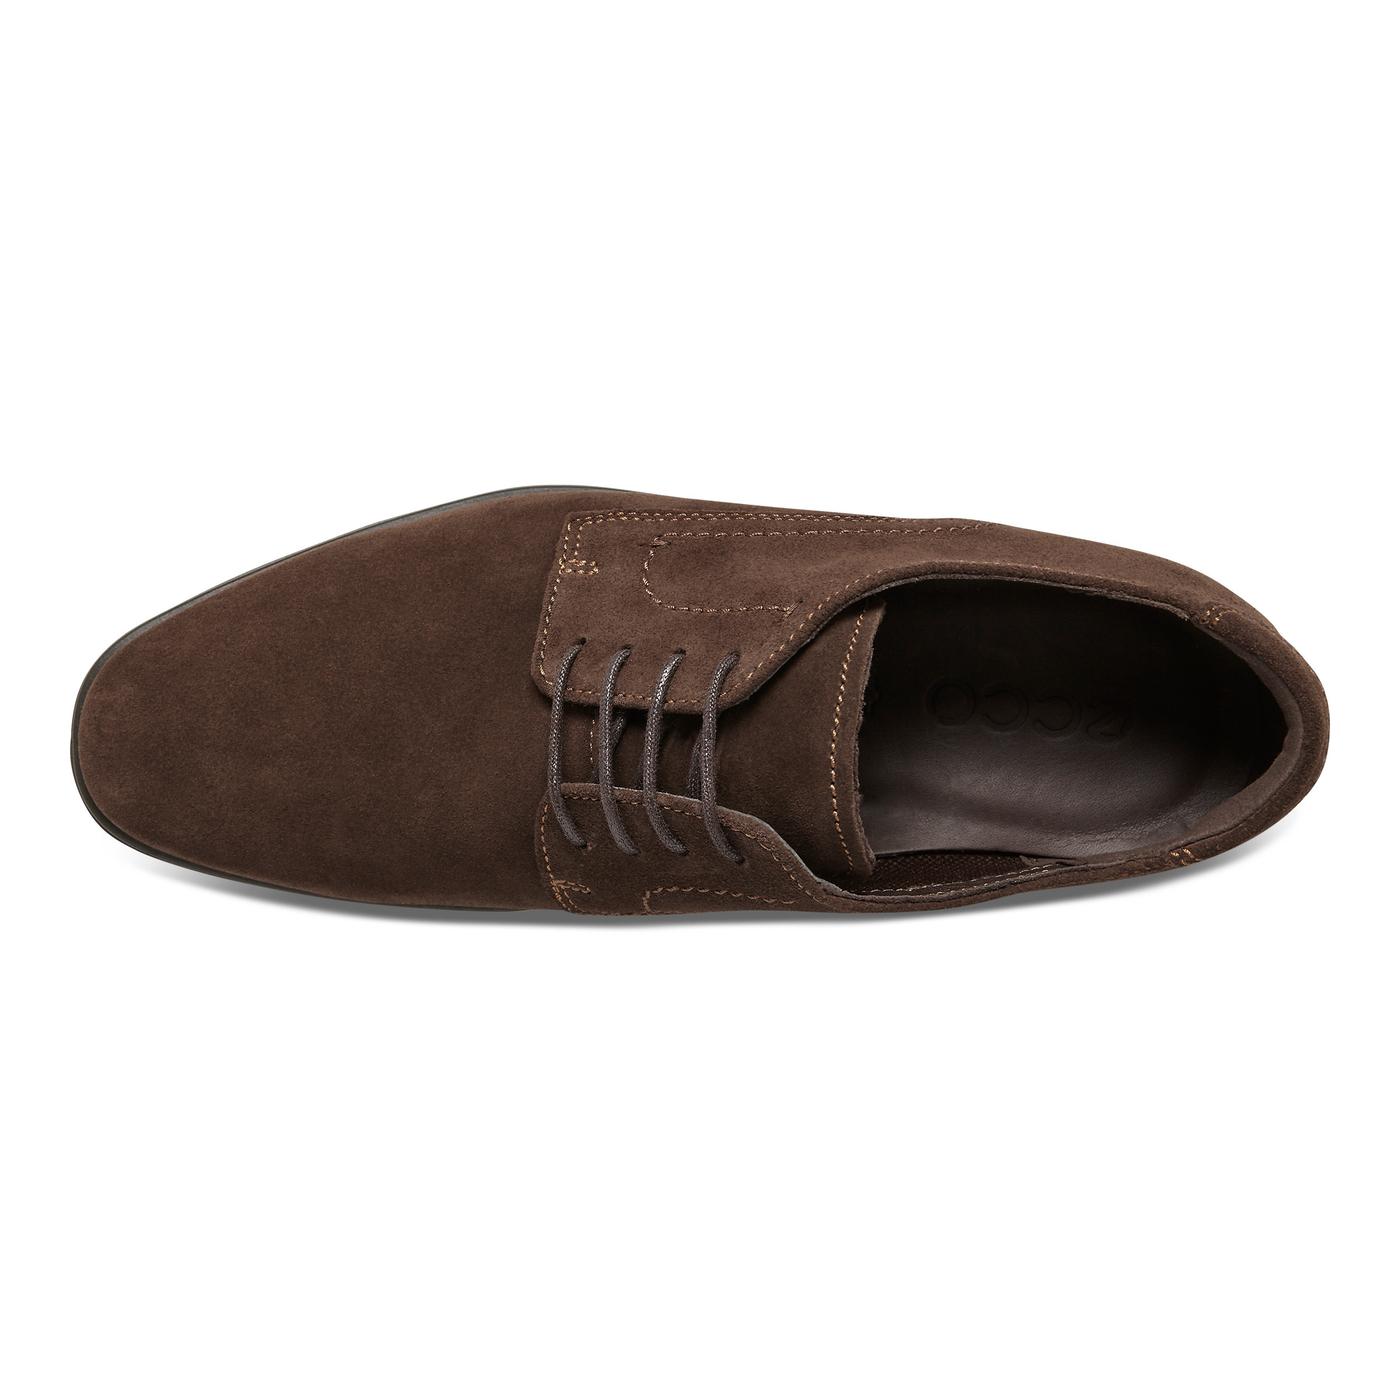 ECCO MELBOURNE Plain Toe Tie